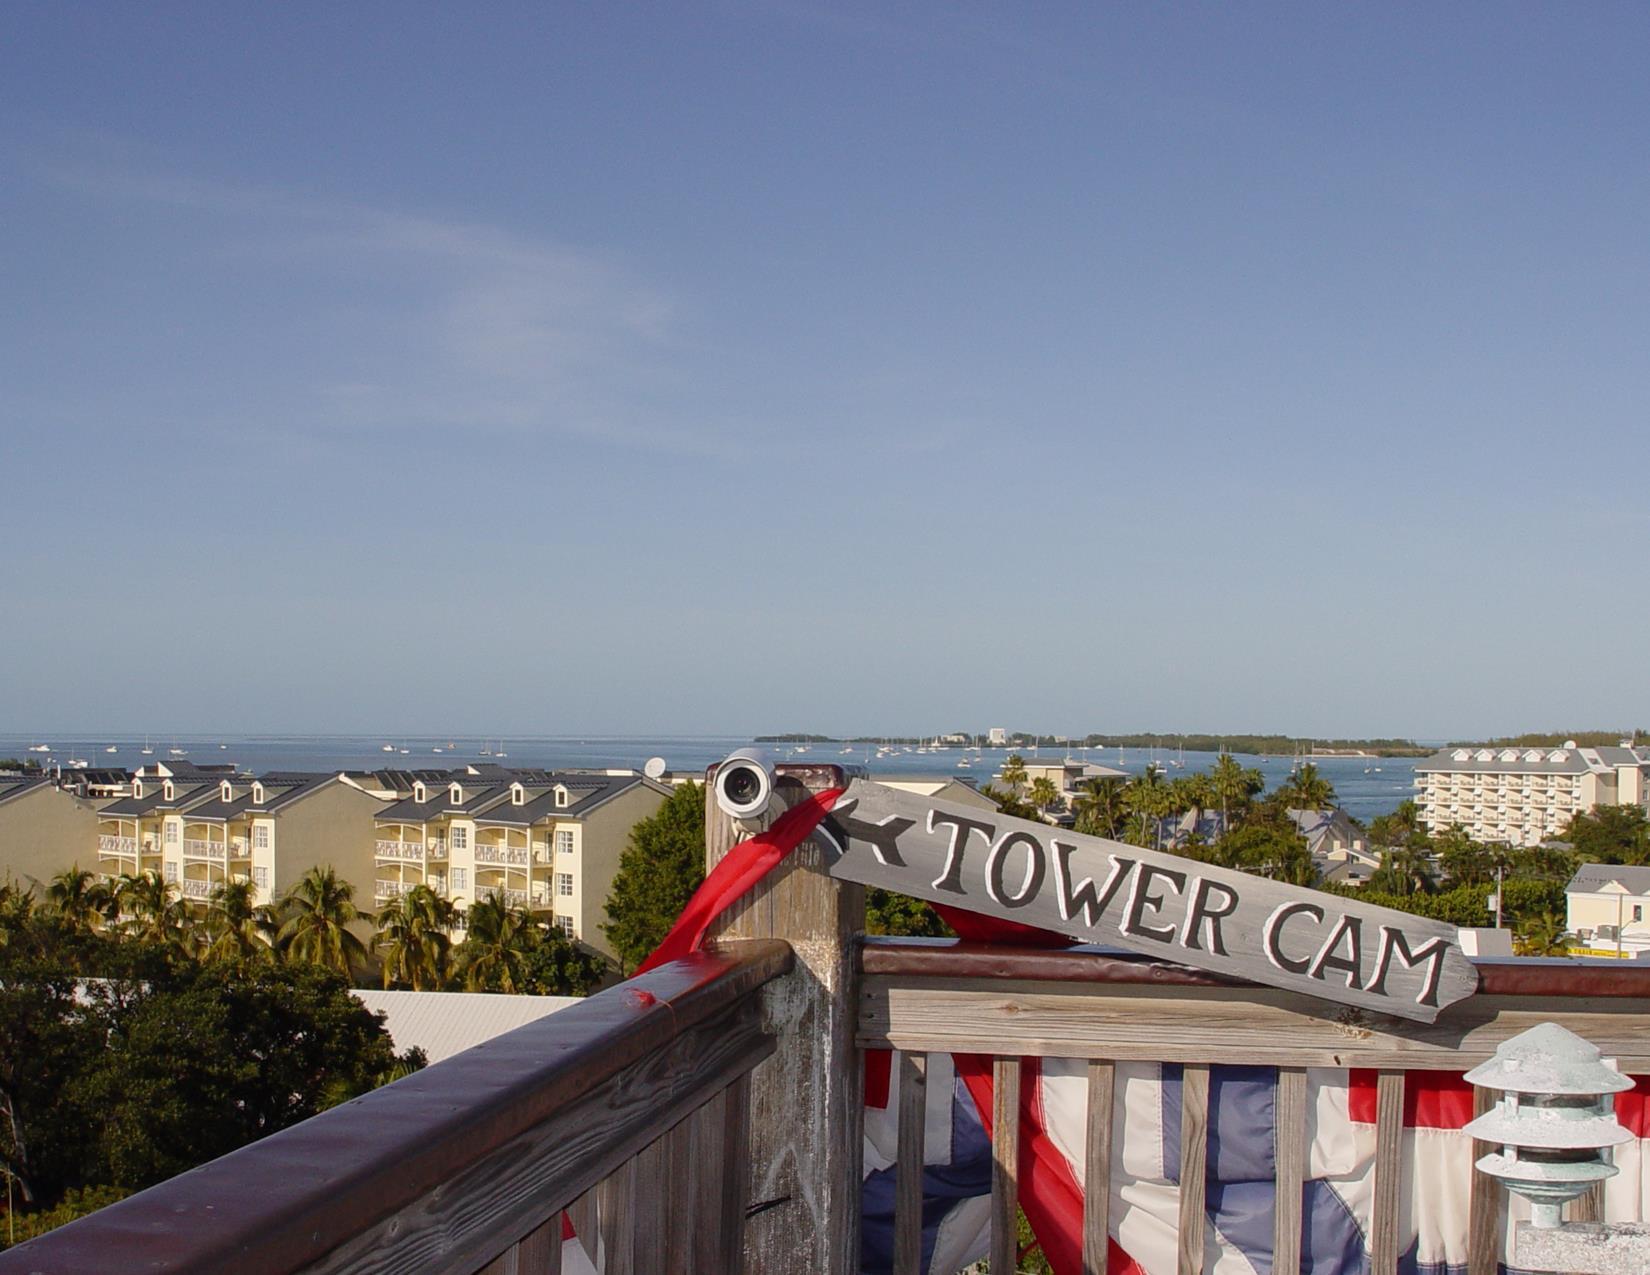 7-key-west-tower-cam